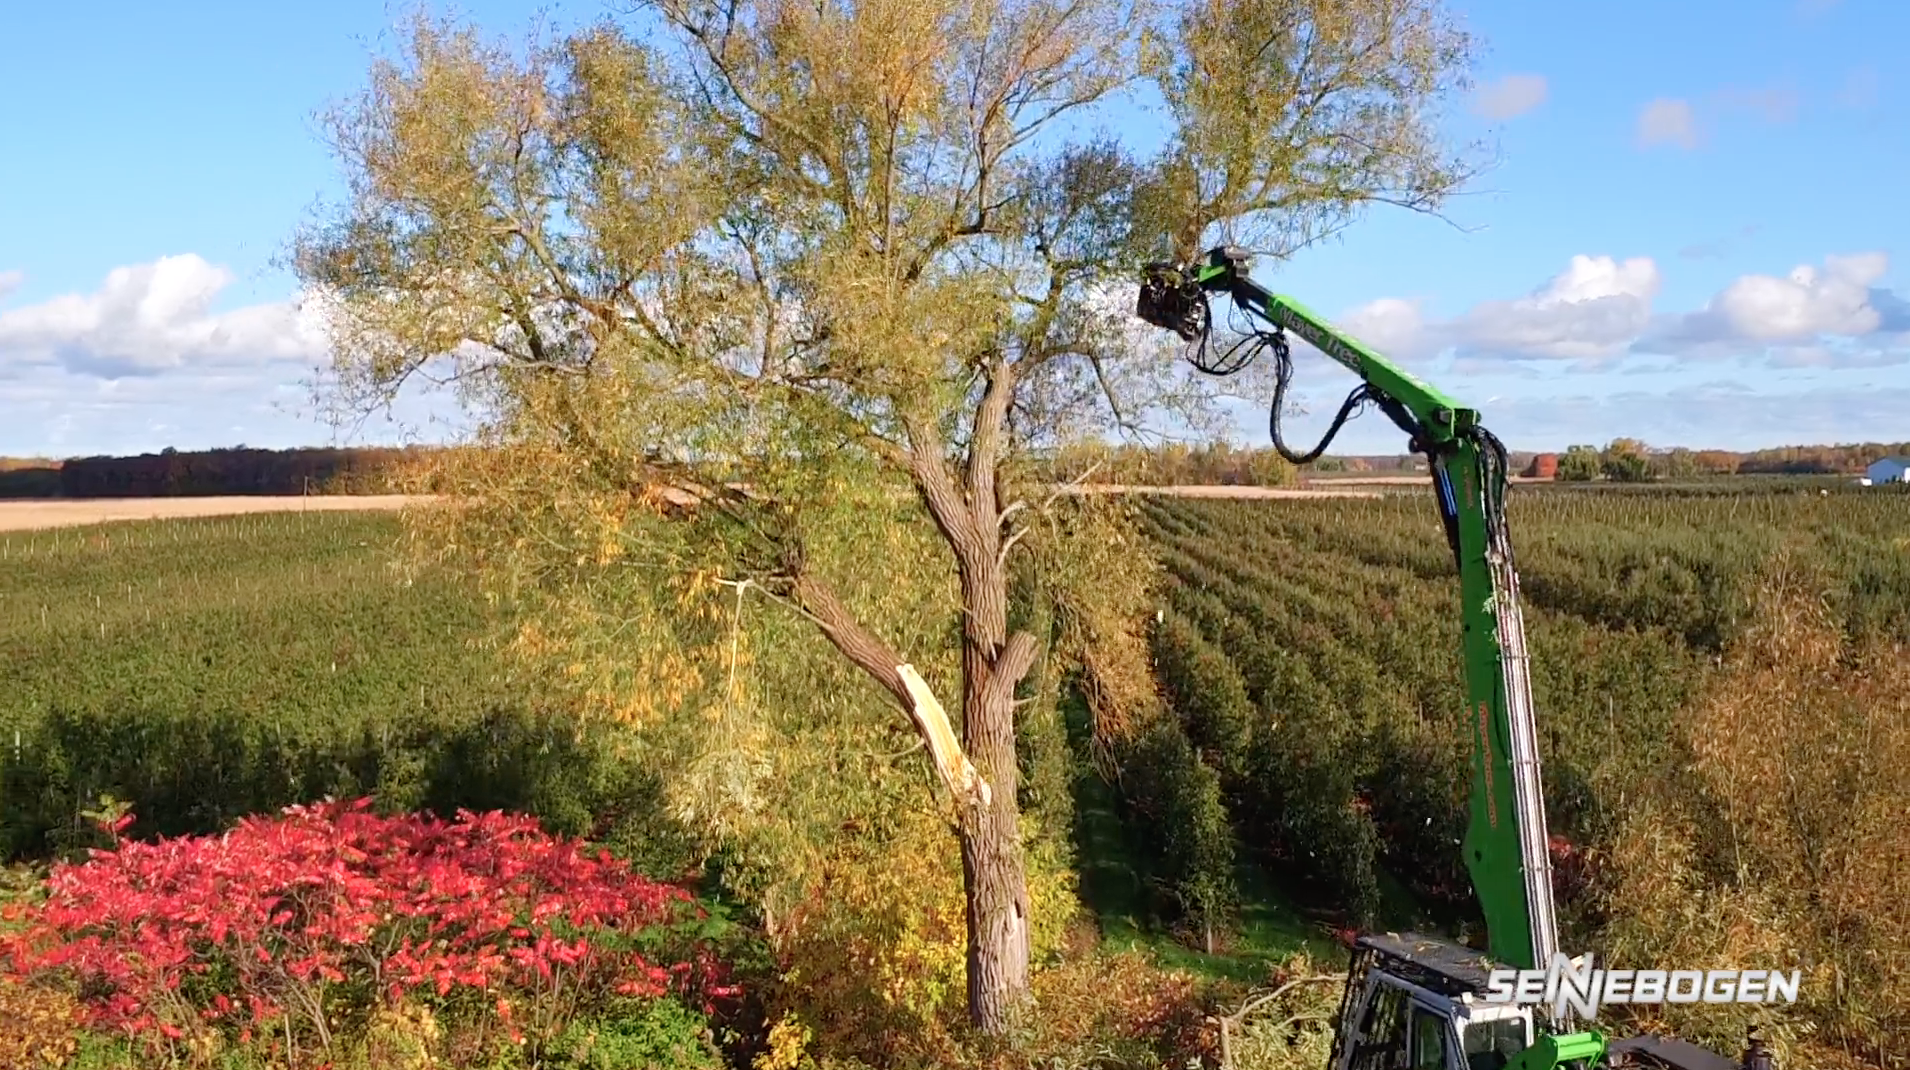 718e tree handler